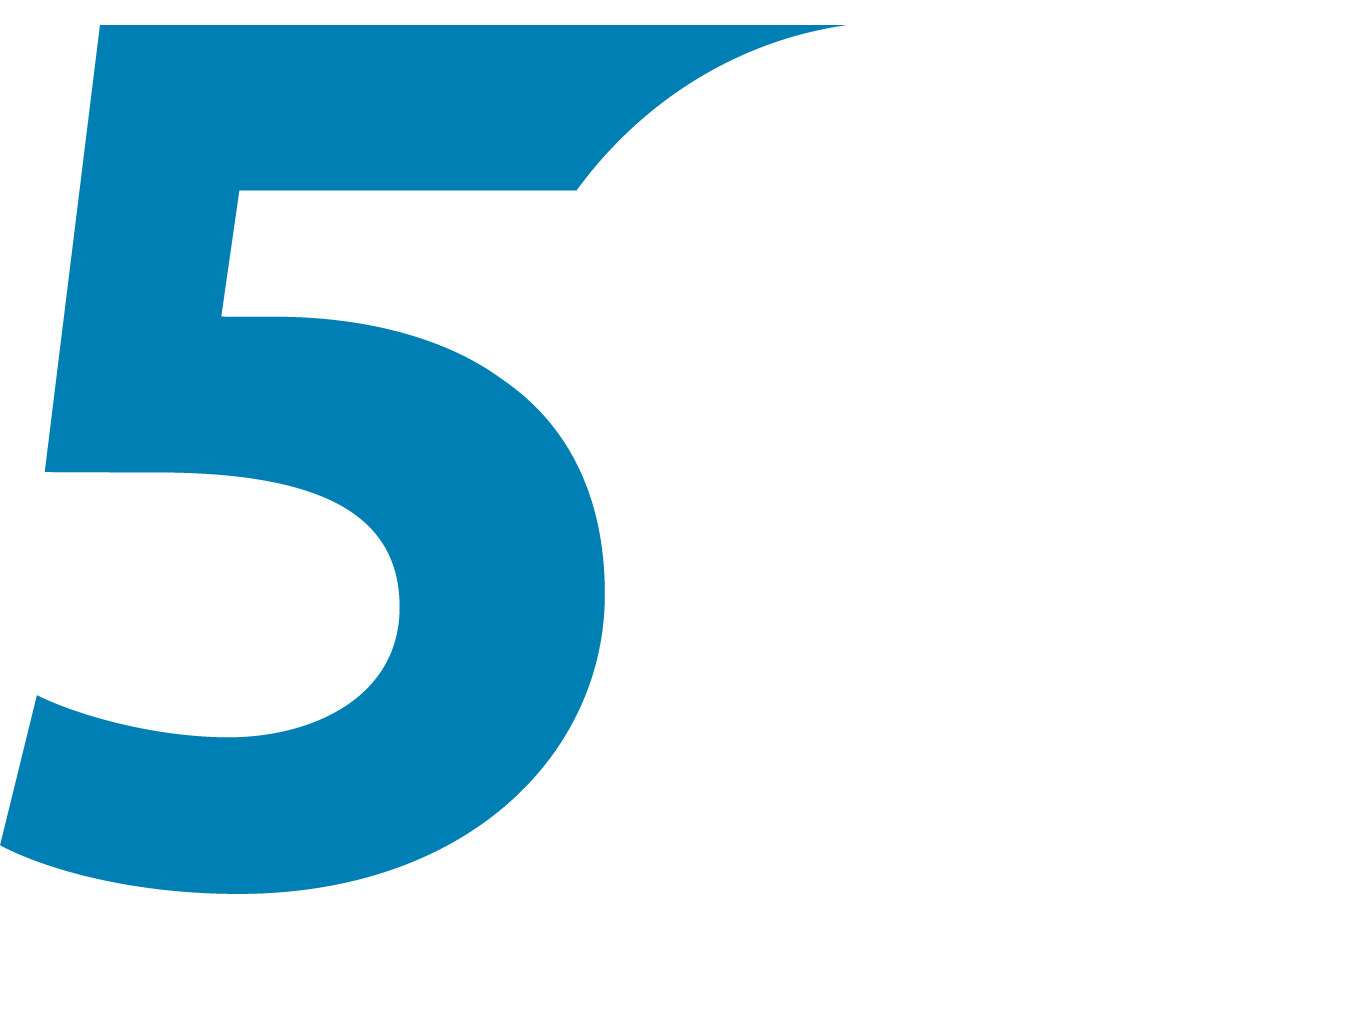 5Q_Logos-FullColorLight copy